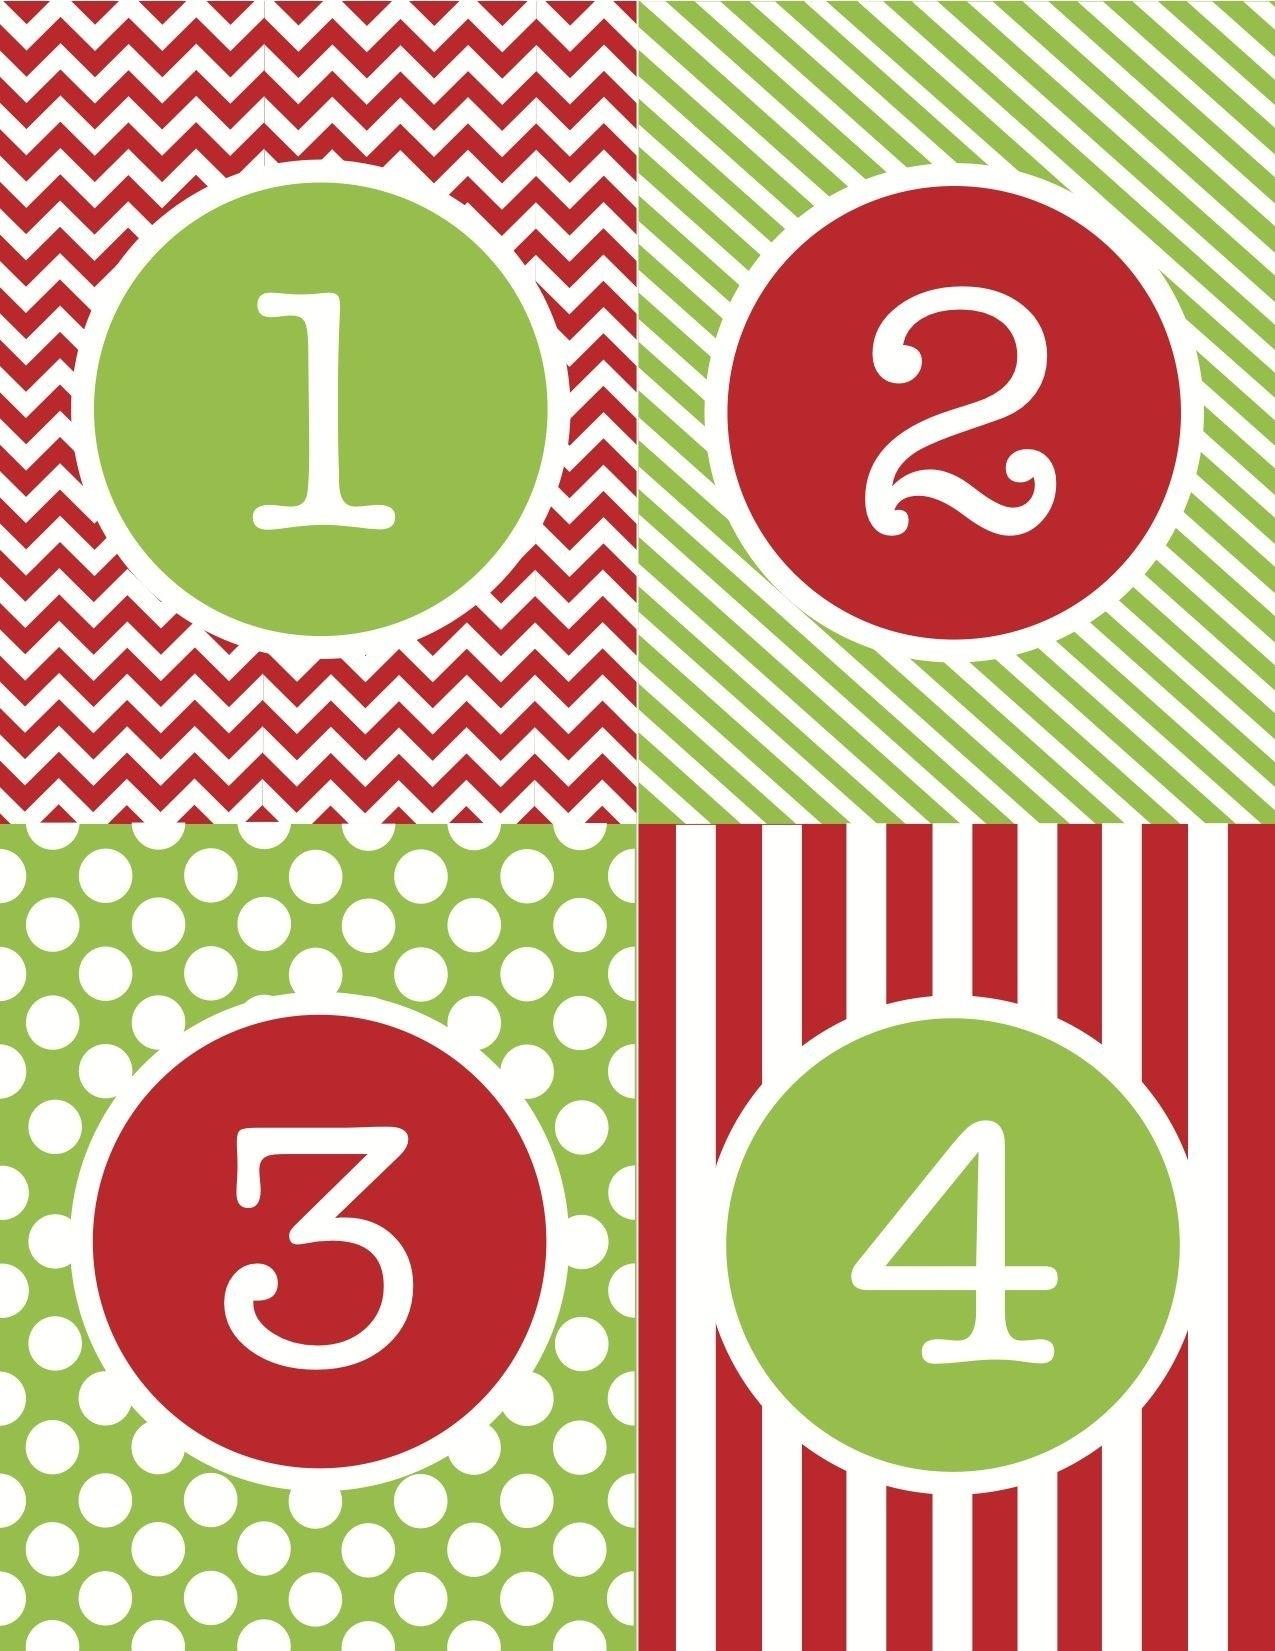 Calendar Numbers 1-31 For Spring :-Free Calendar Template